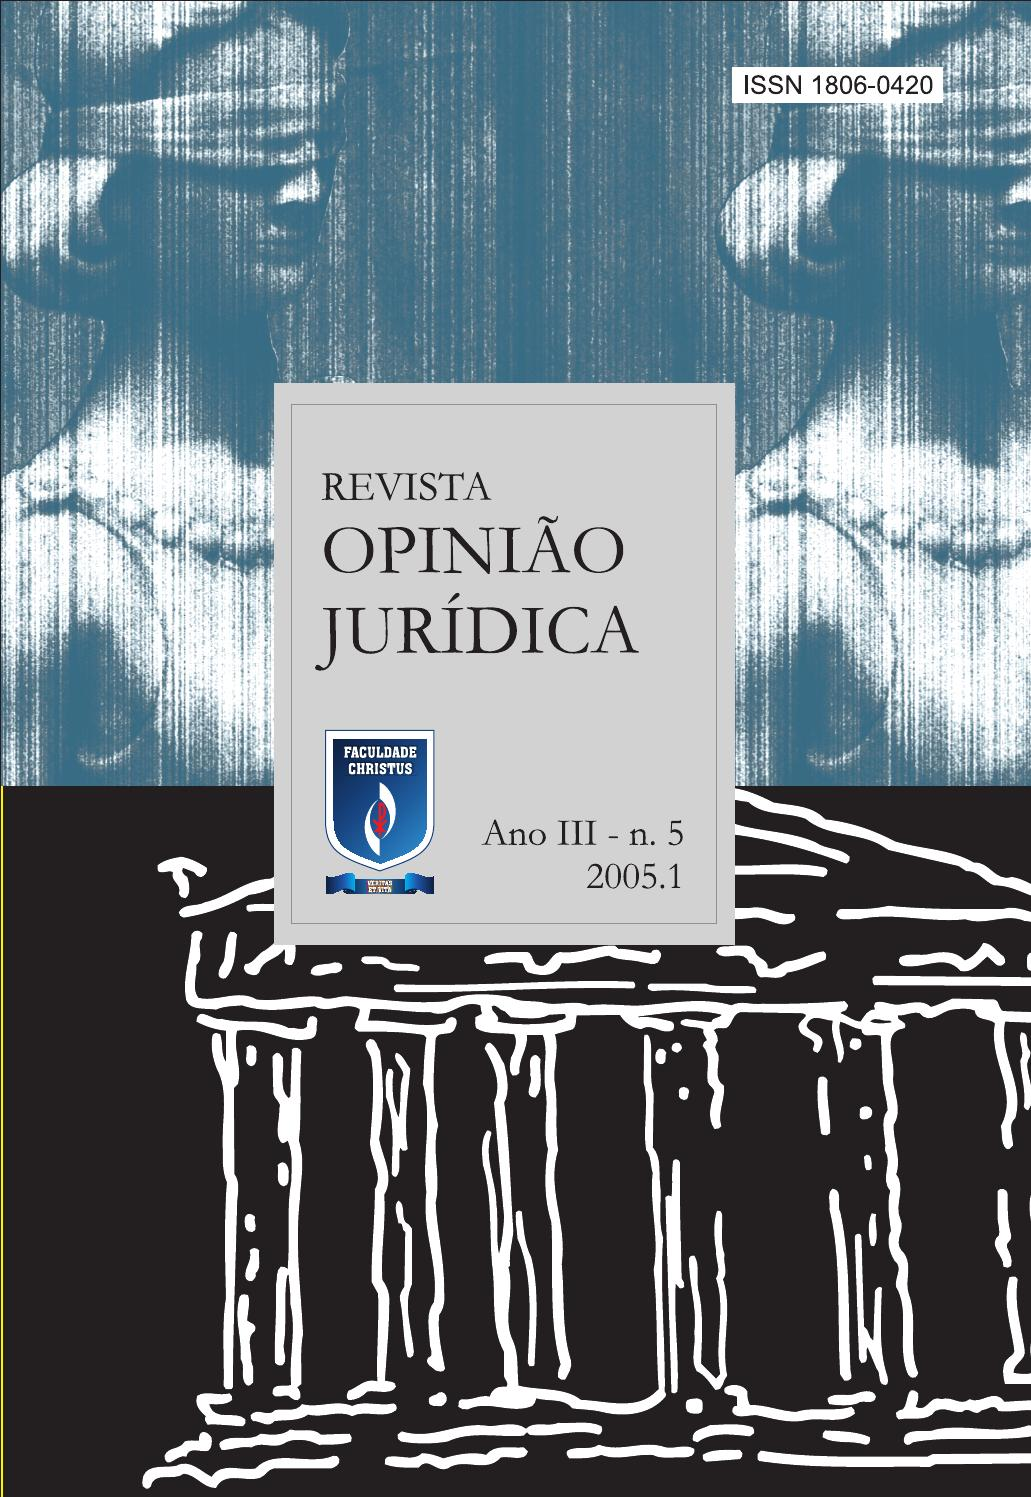 db0ff4133 Revista opinião jurídica 05 by Unichristus - issuu